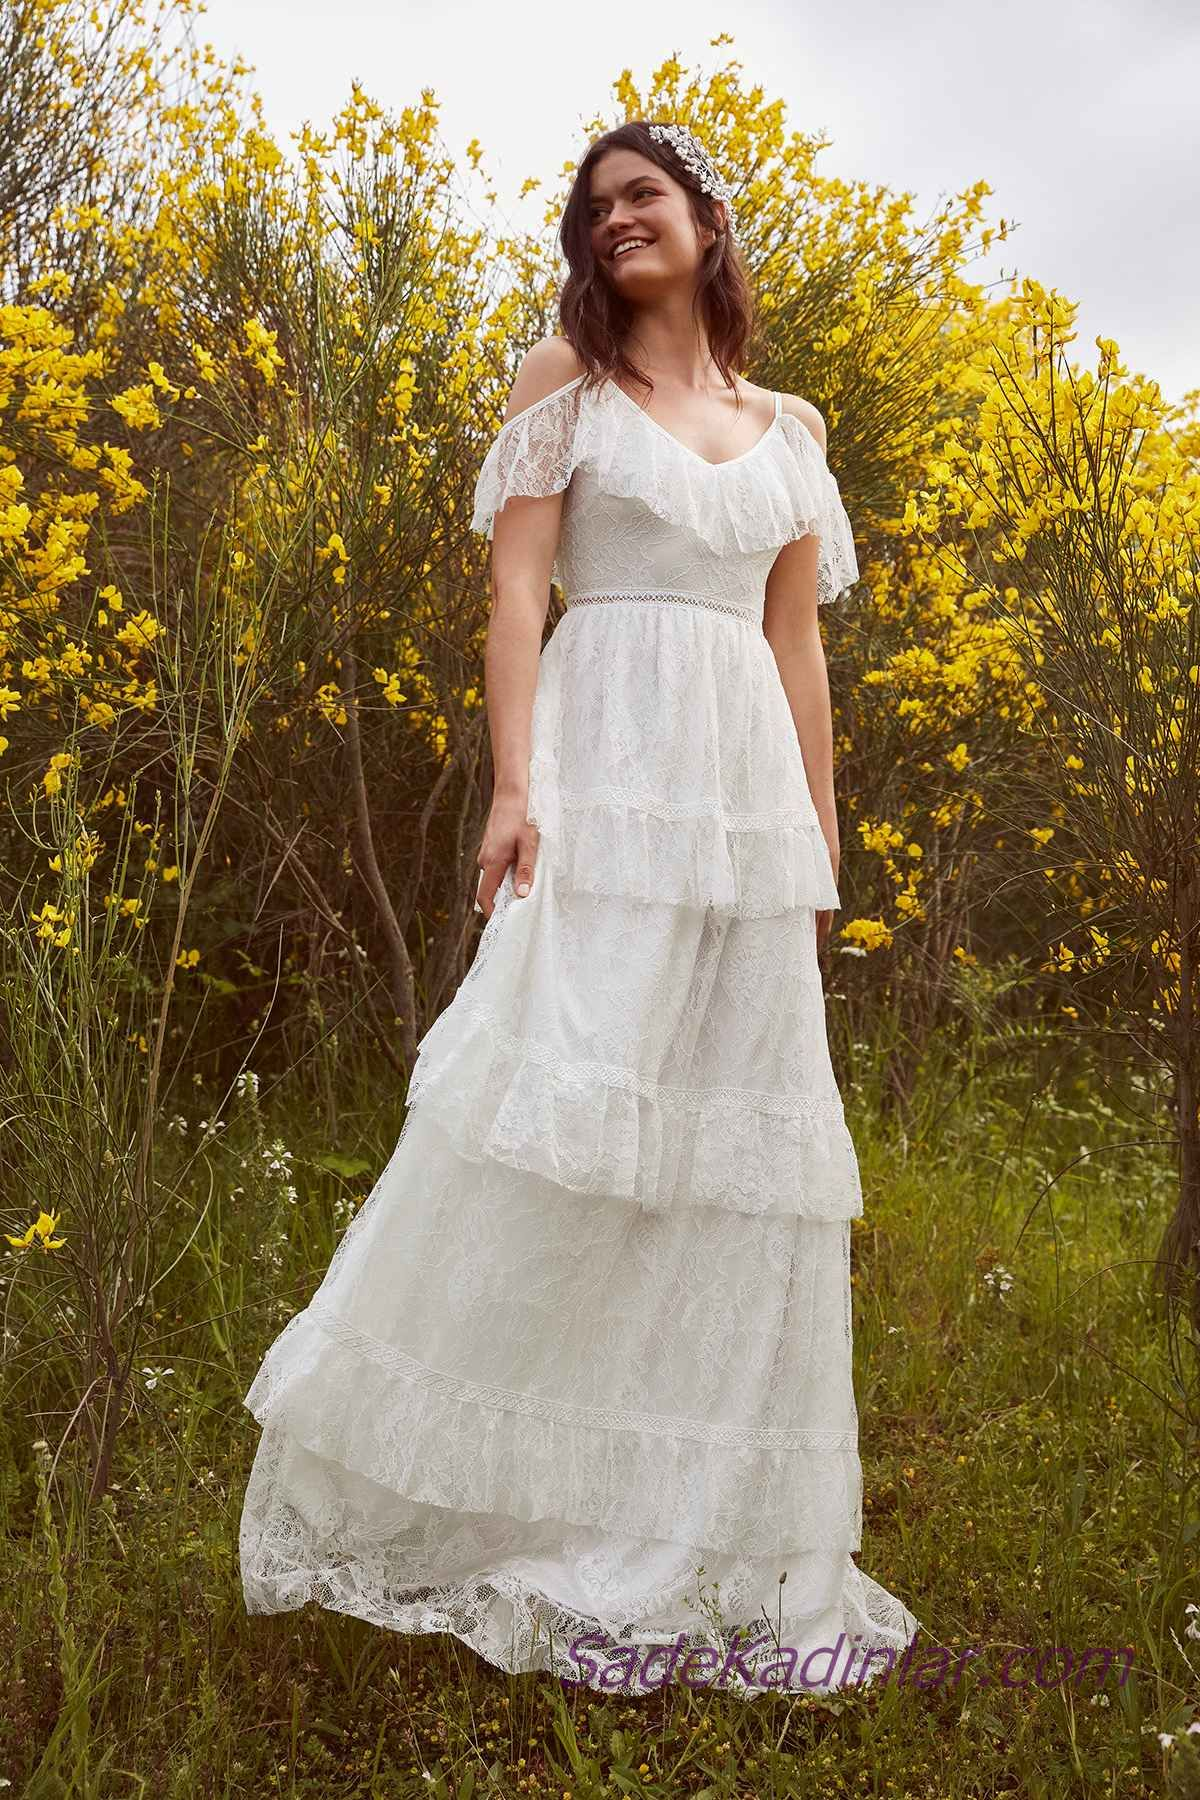 En Guzel 2020 Beyaz Elbise Modelleri Uzun Askili Dusuk Kol Firfir Detayli Katmanli Etek Elbise Modelleri Elbise Beyaz Dugun Elbiseleri